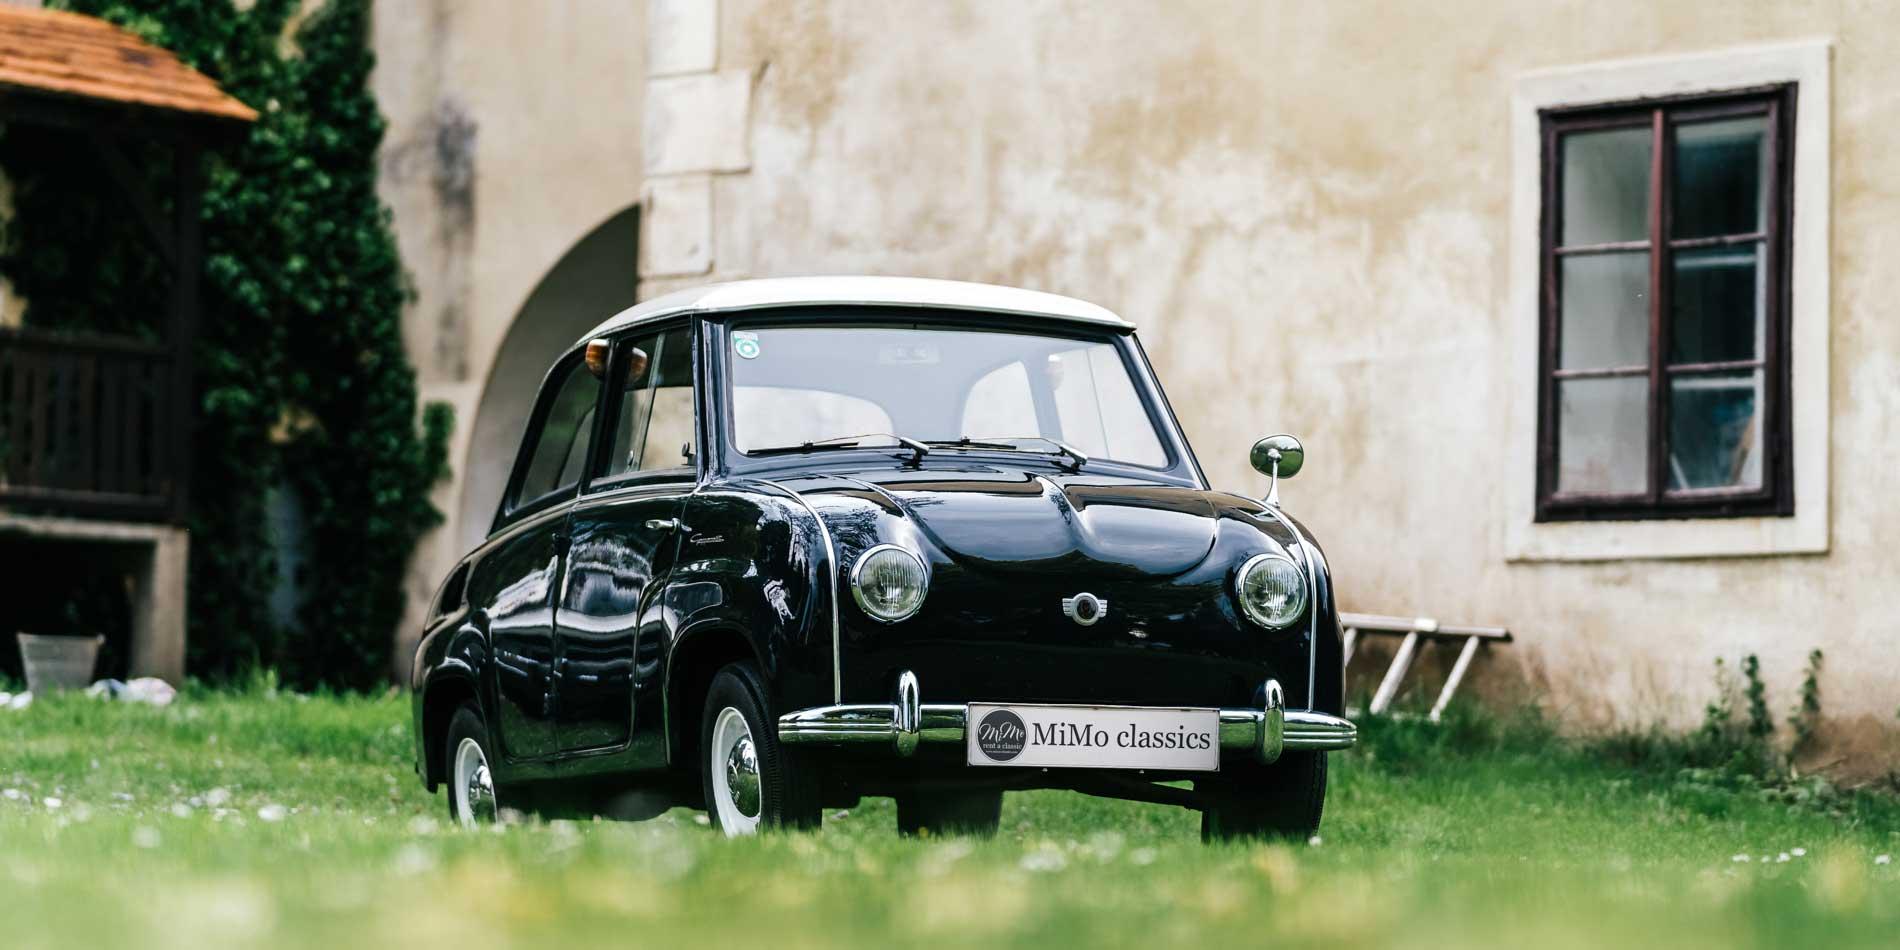 mimo-classics-oldtimervermietung-graz-goggomobil-01